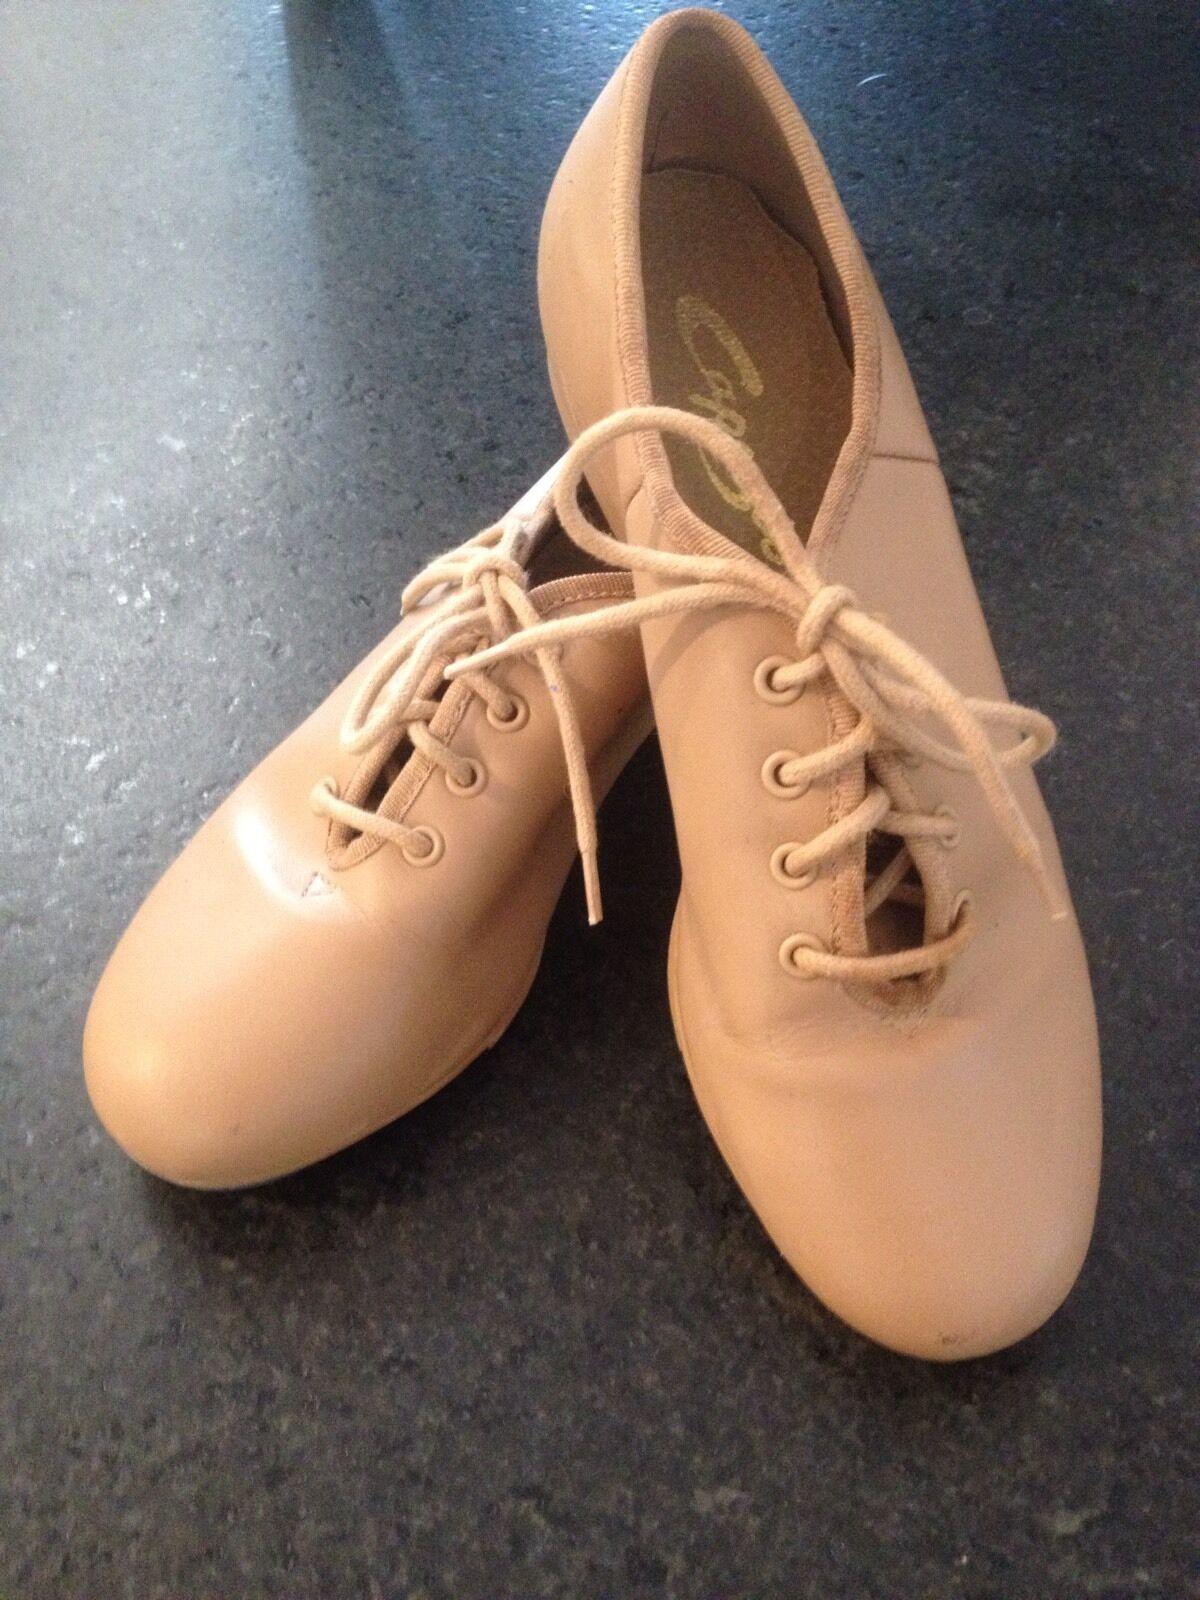 Capezio CG55 adult Teletone xtreme tap shoes in CARAMEL